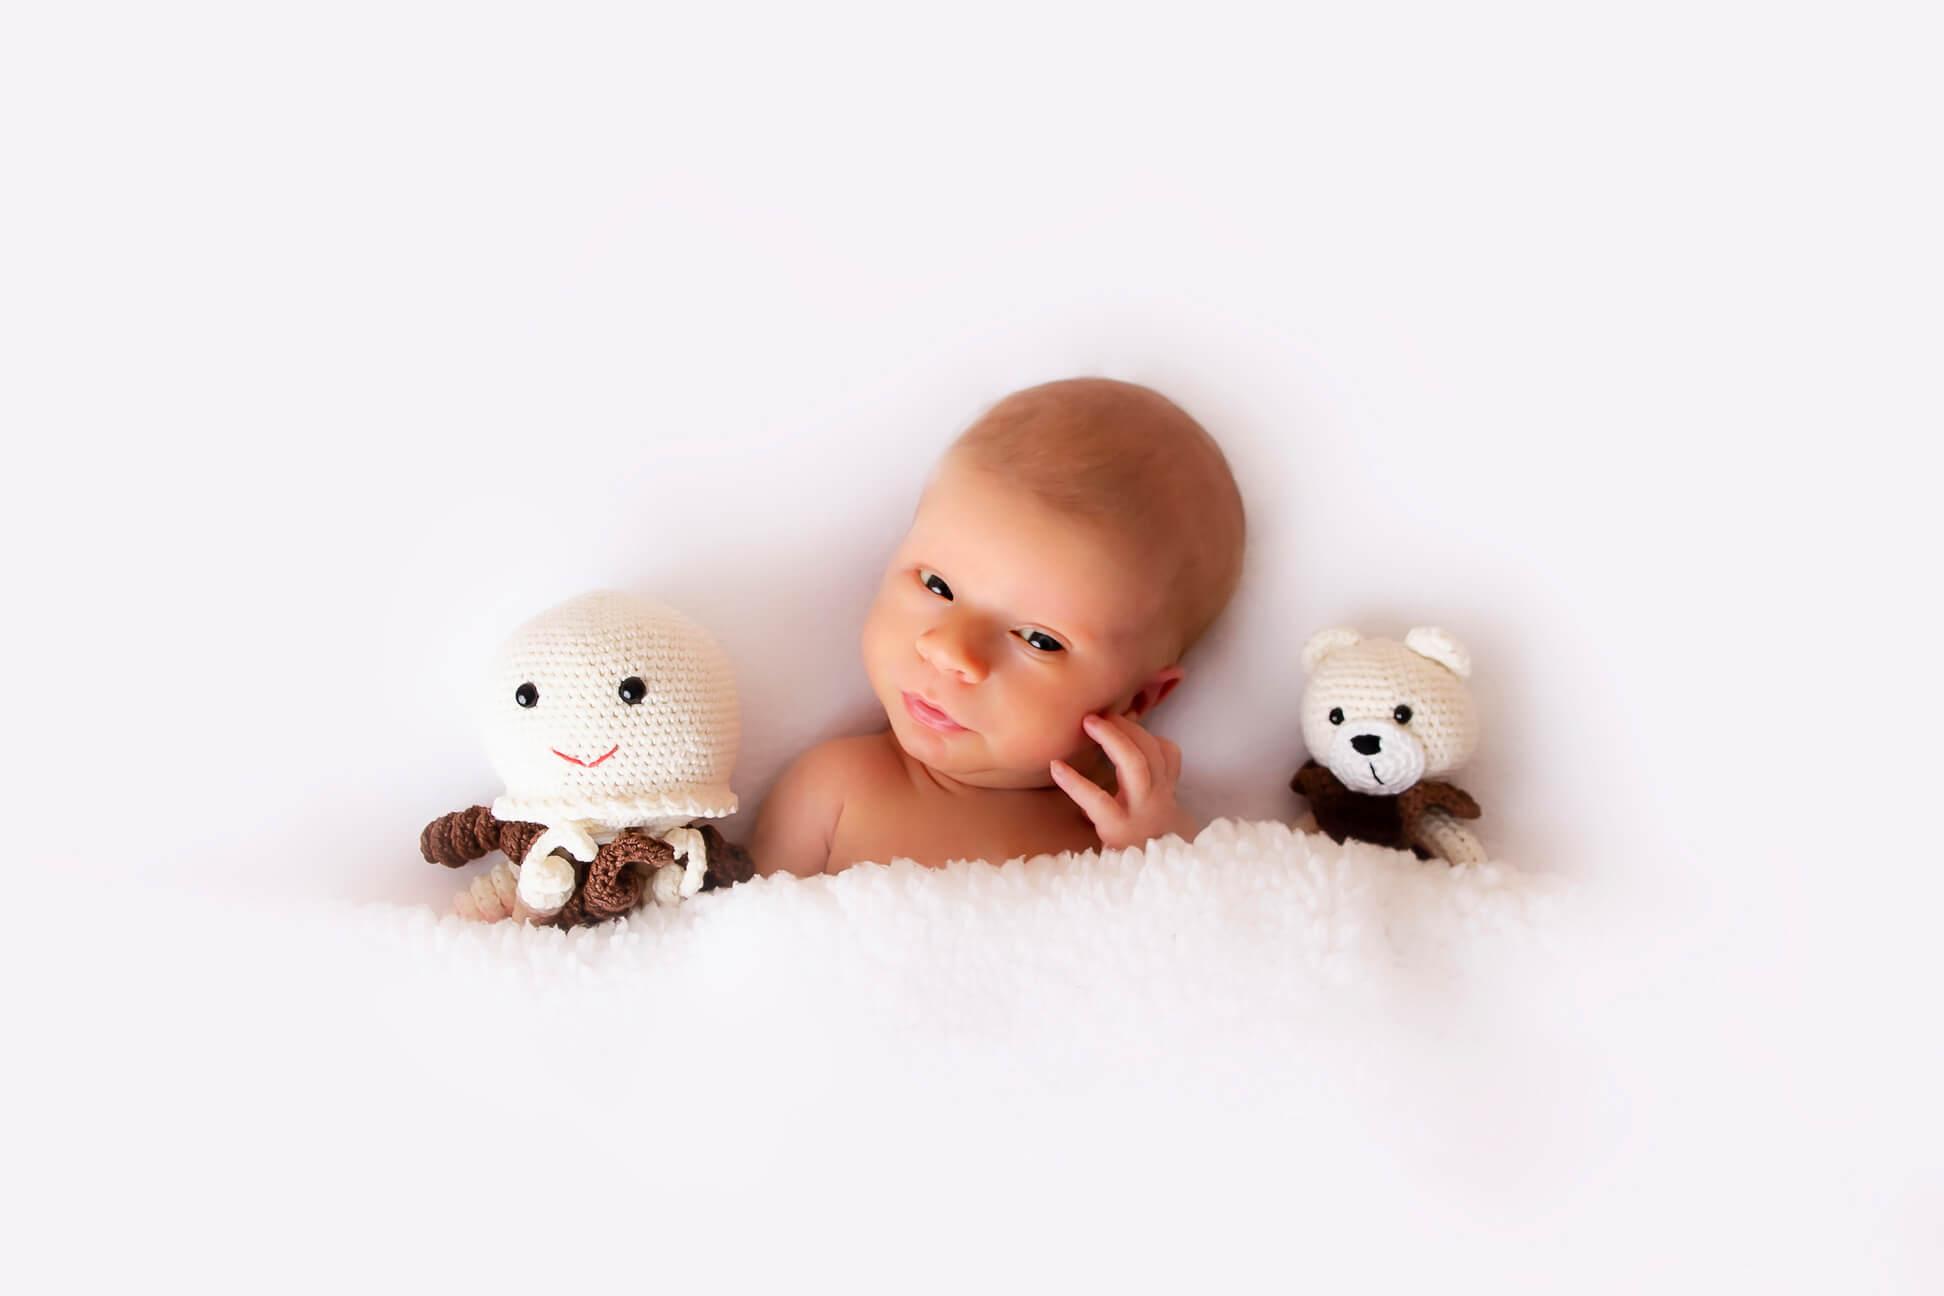 Novorodenecké fotenie od fotografky v Nových Zámkoch - Kitti Photo